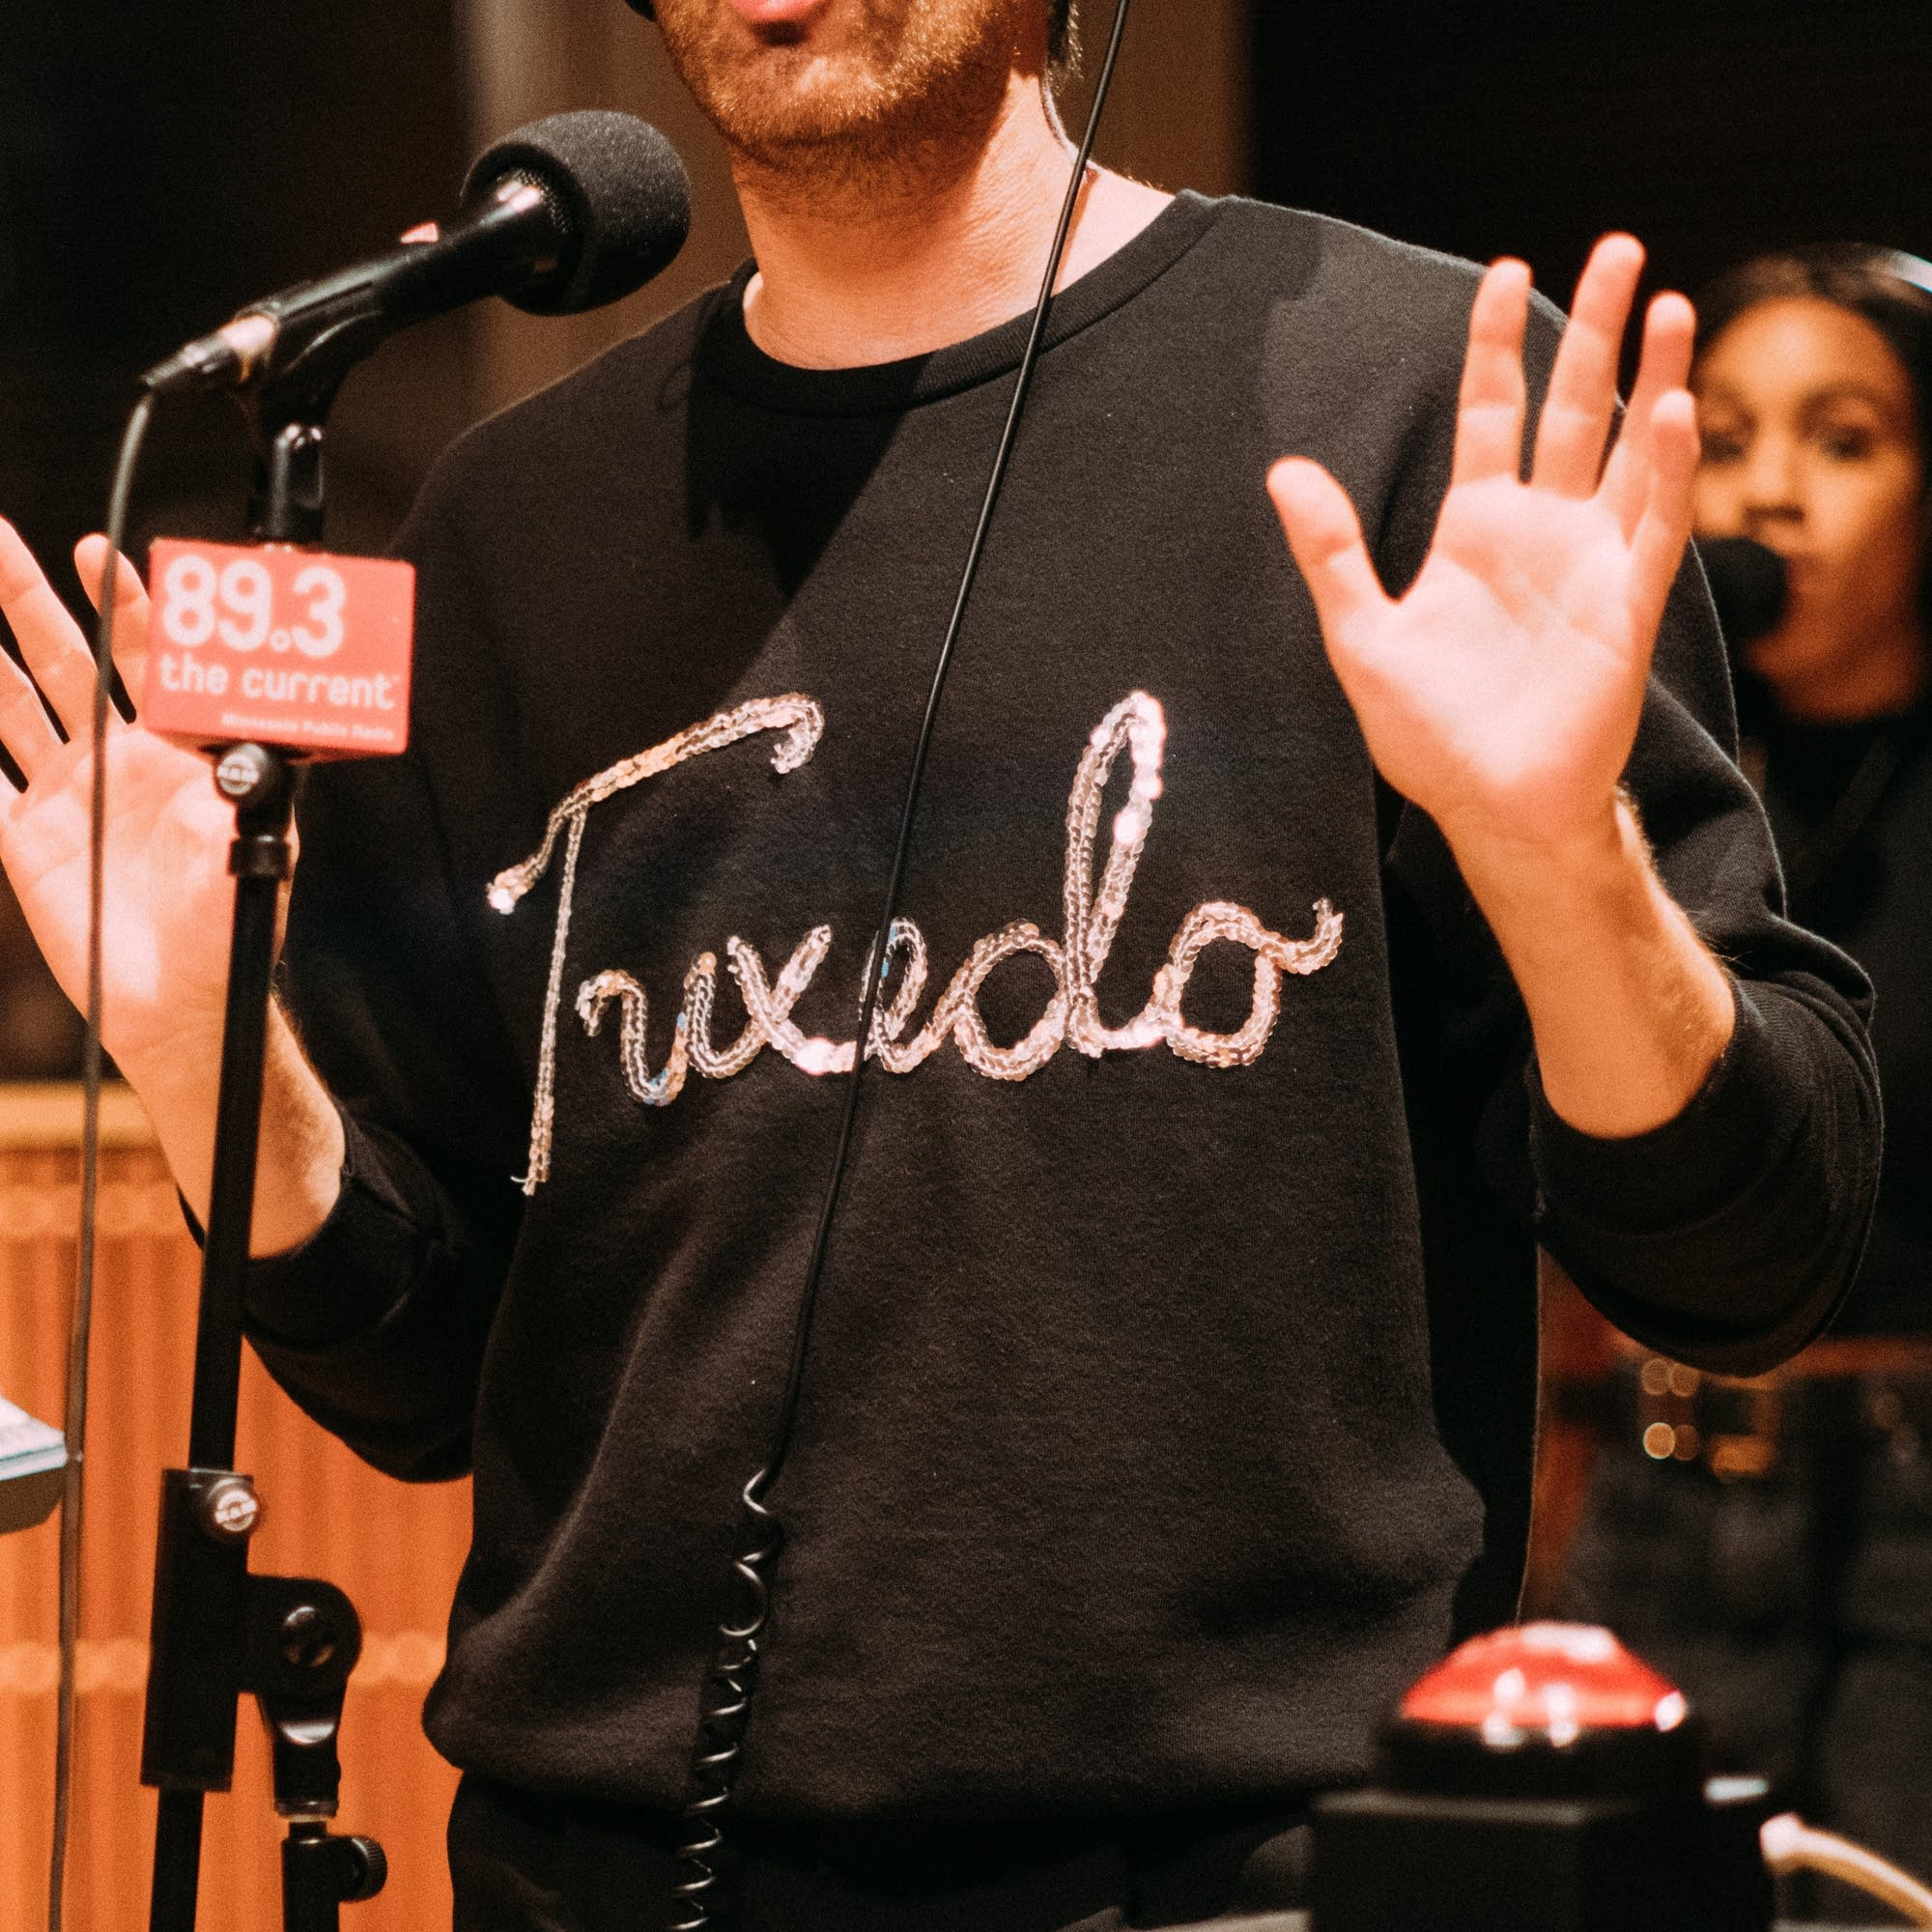 Tuxedo perform in The Current studio